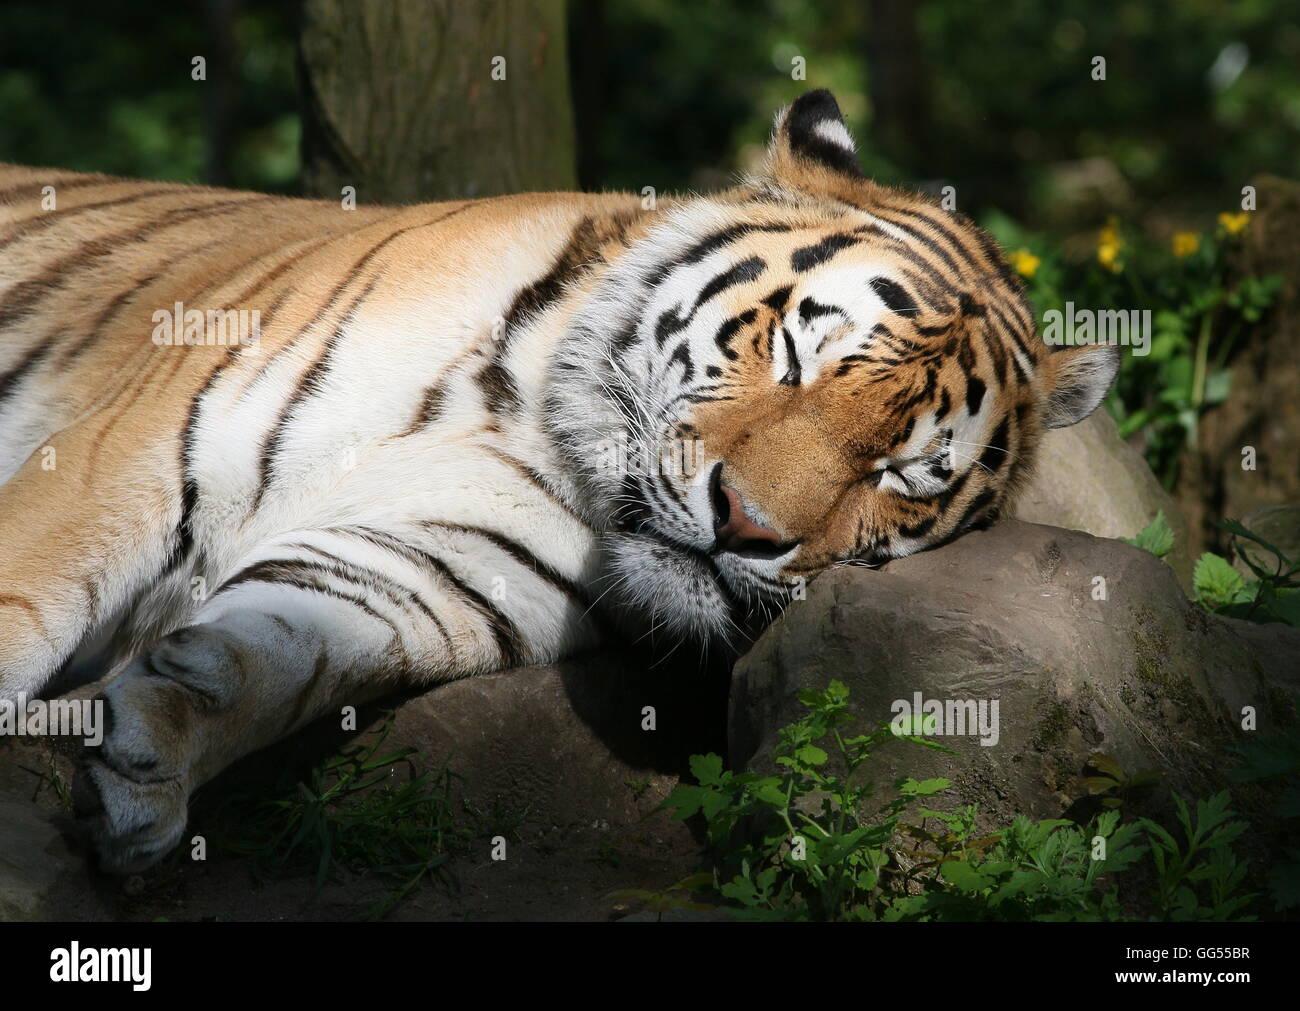 Ou Sibérie Amur tiger (Panthera tigris altaica) prendre une sieste au soleil Photo Stock